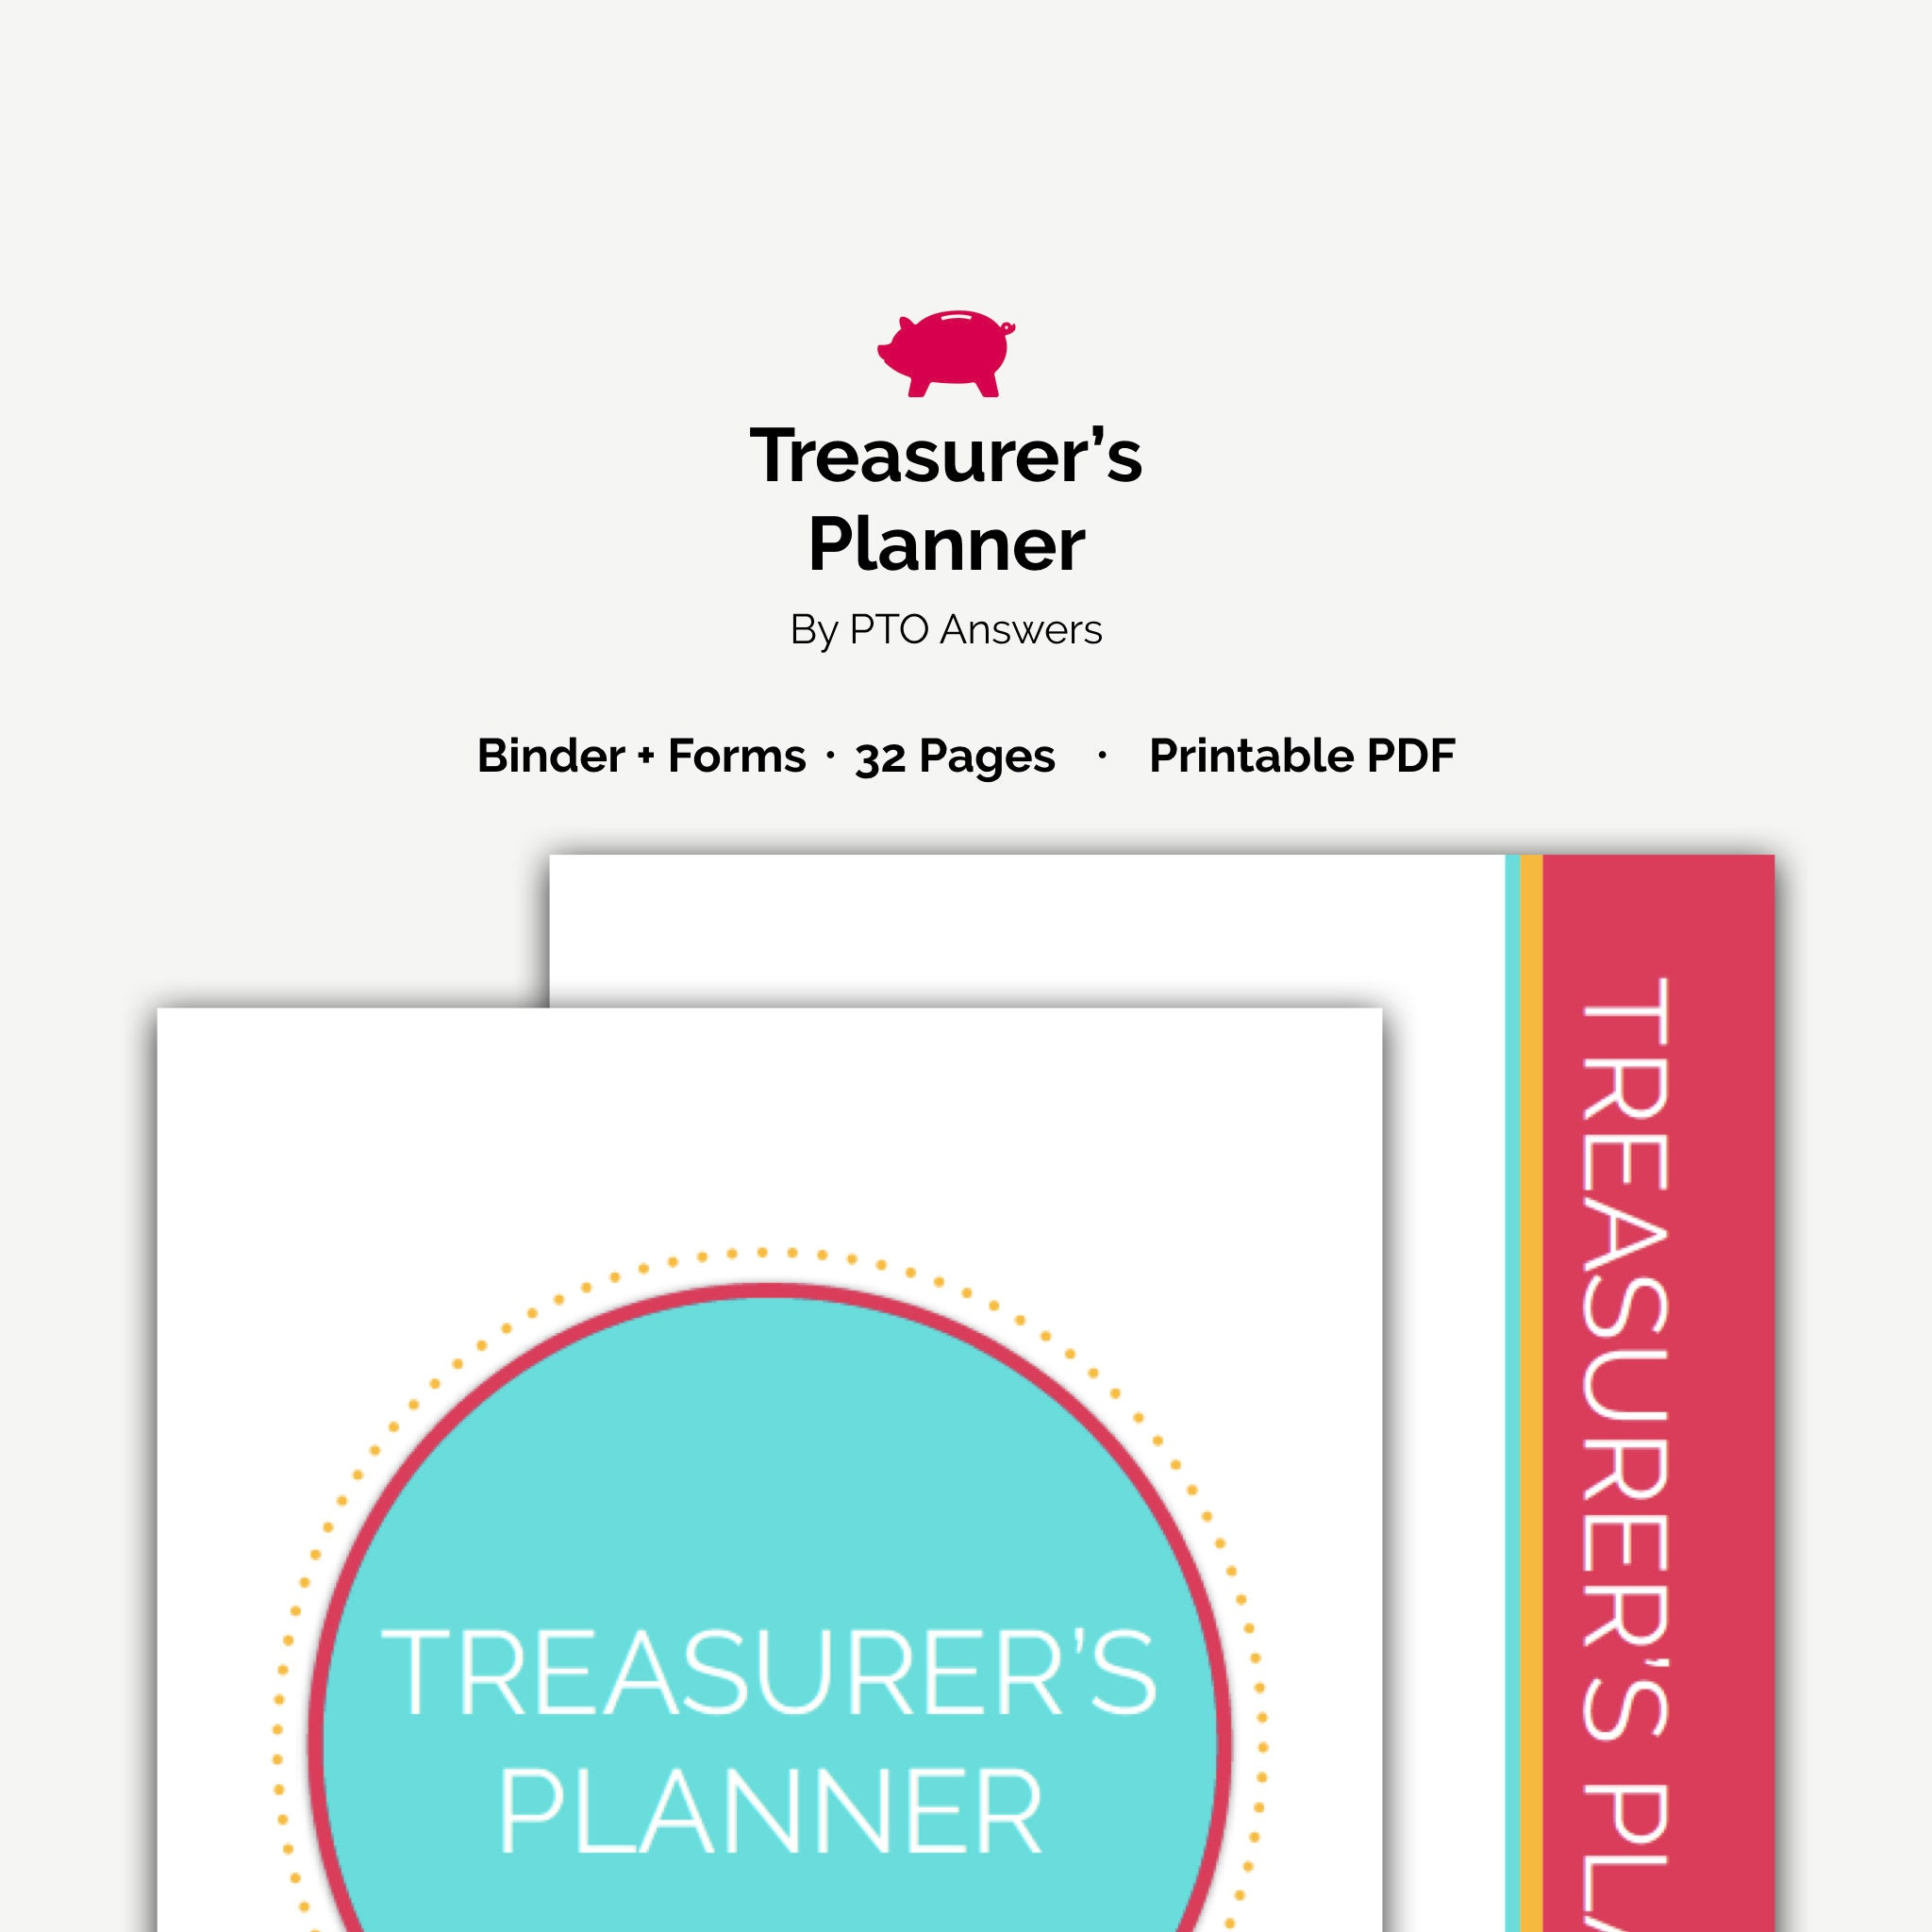 PTA/PTO Treasurer's Planner, Printable Planner with treasurer forms to ease  treasurer duties for complete PTO finance management